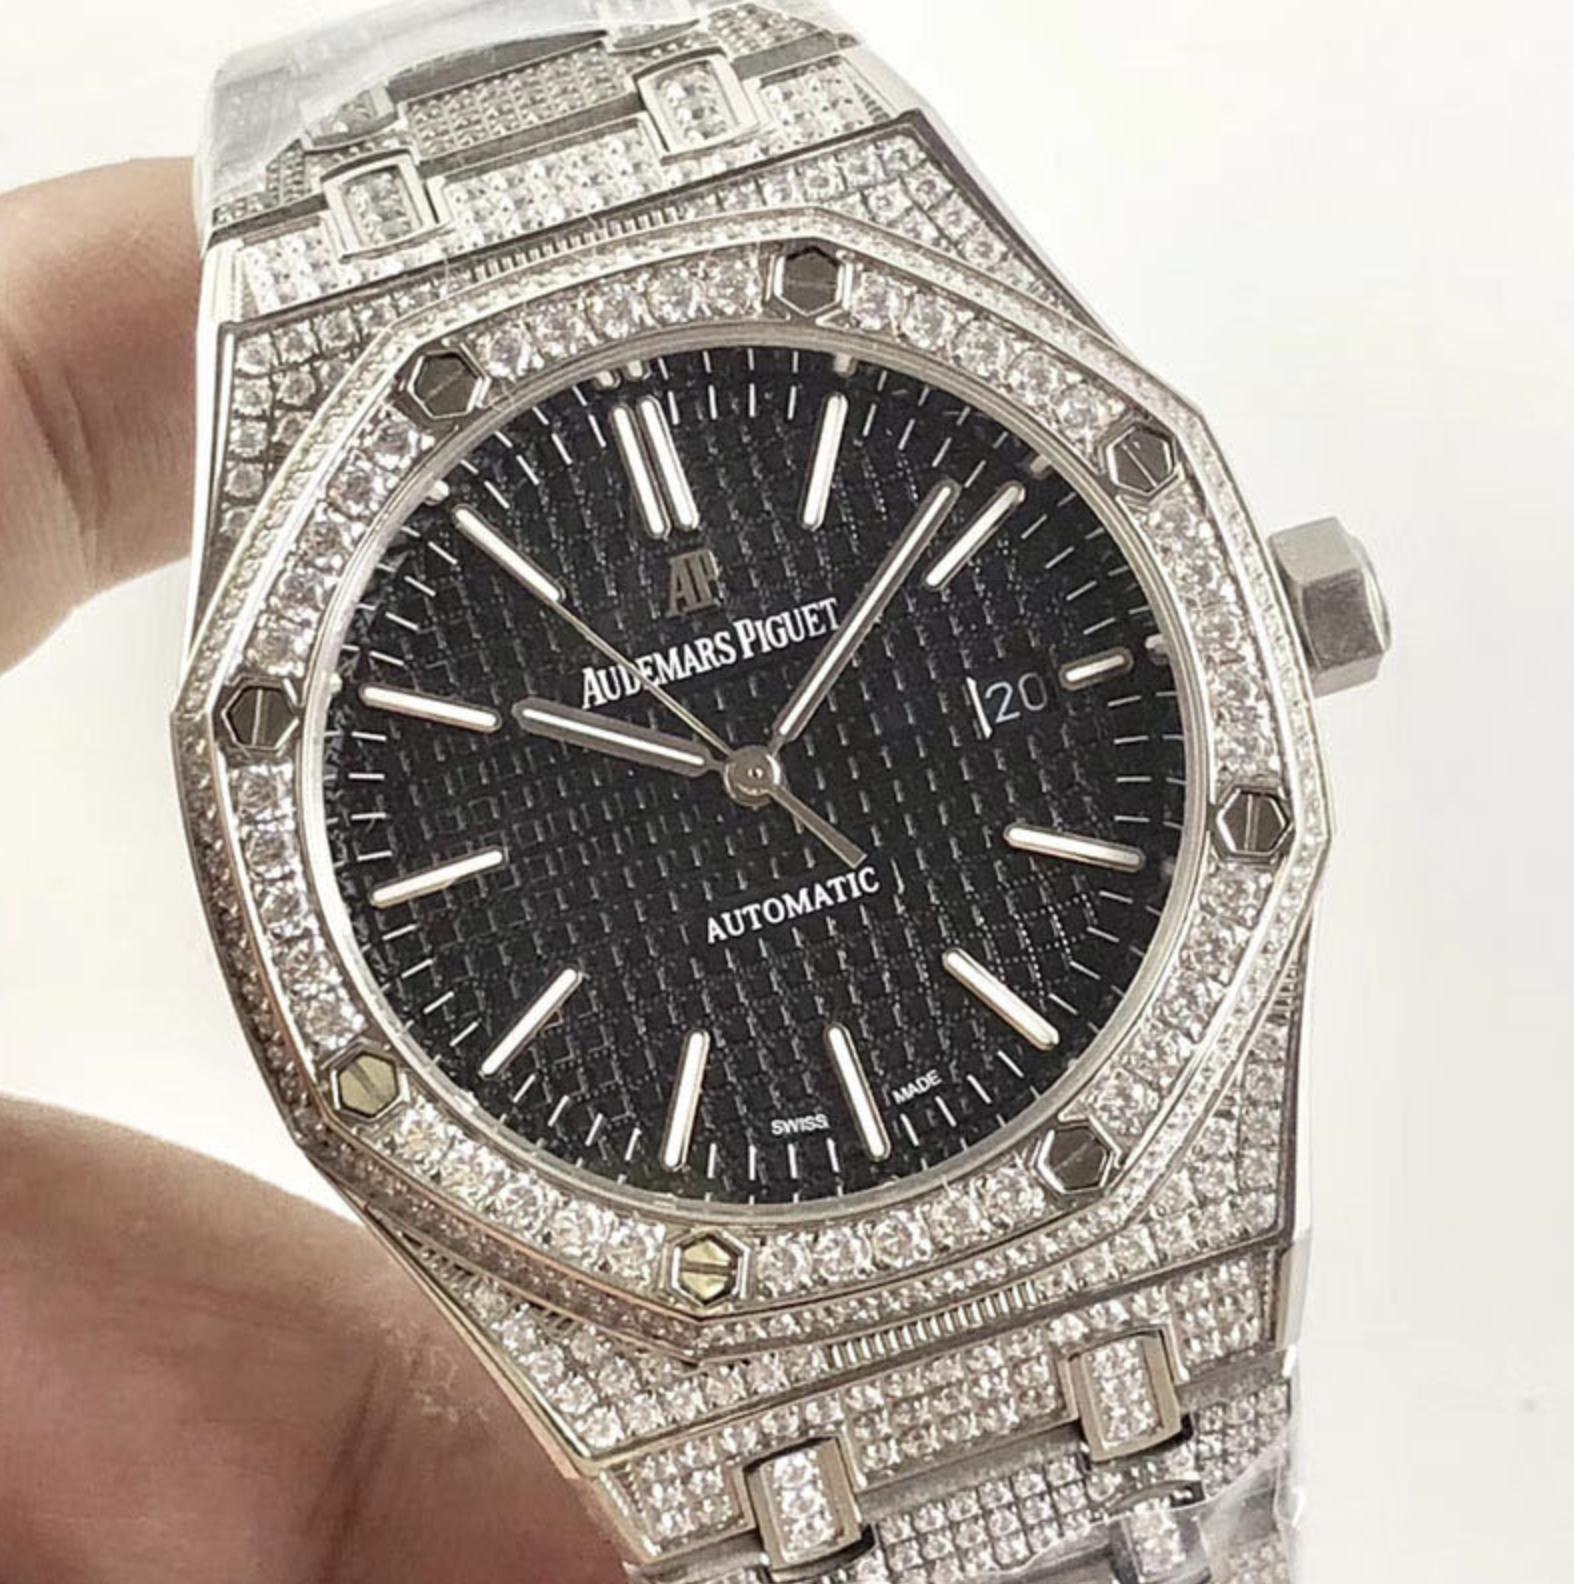 Audemars piguet replica royal oak 15400ST 41mm white gold full paved diamonds black dial